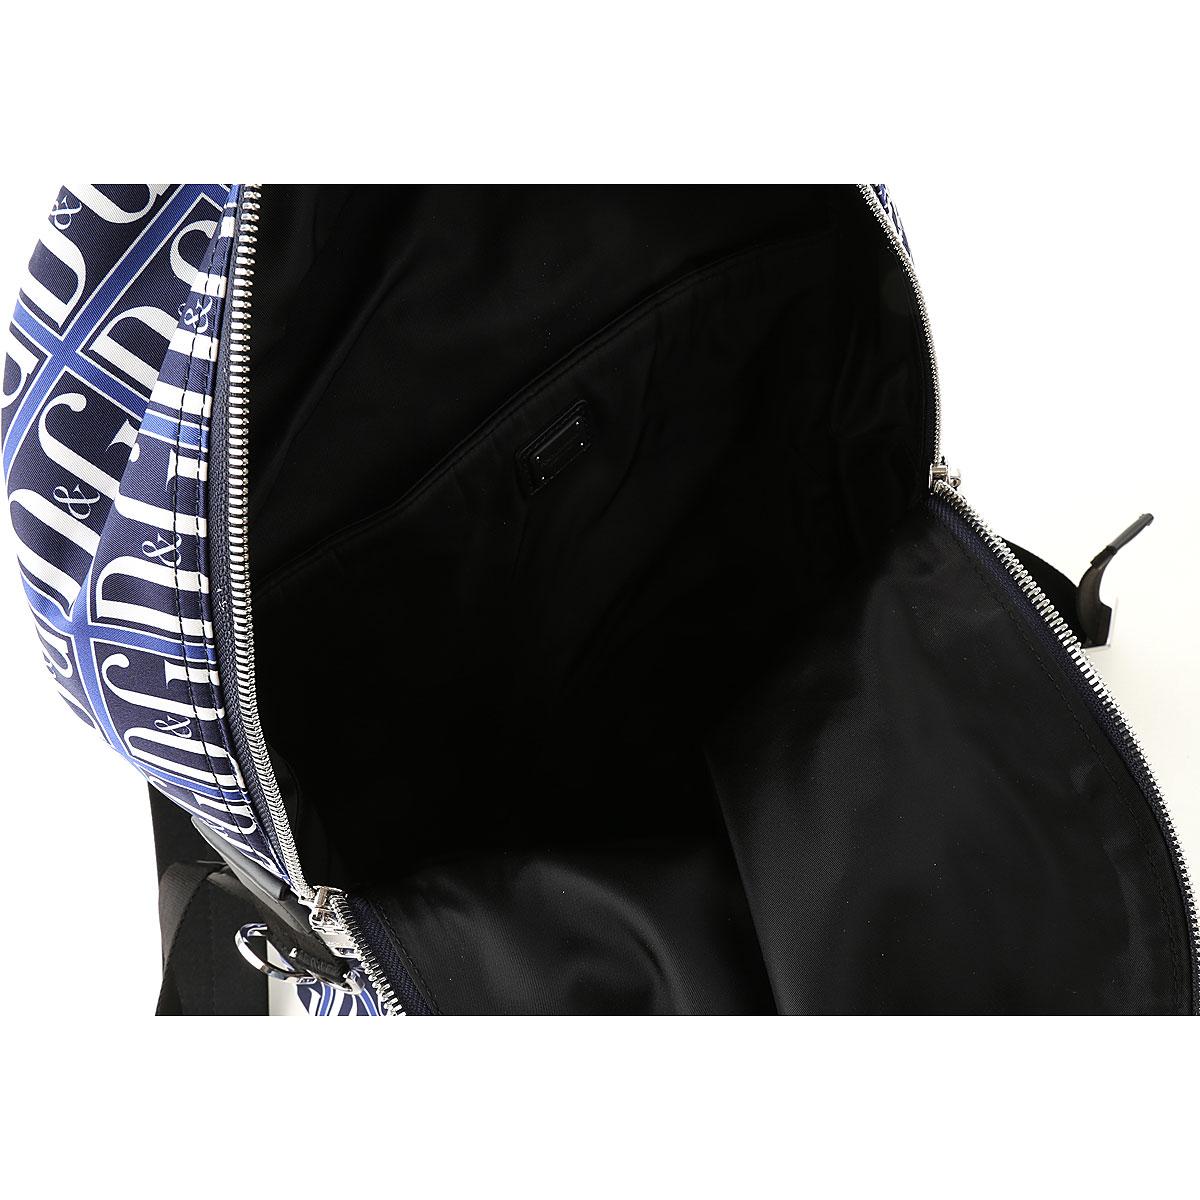 Tinta Primavera Carteras verano Azul amp; Bolsos Gabbana Blanco 2019 Dolce Ow4qPv6y7